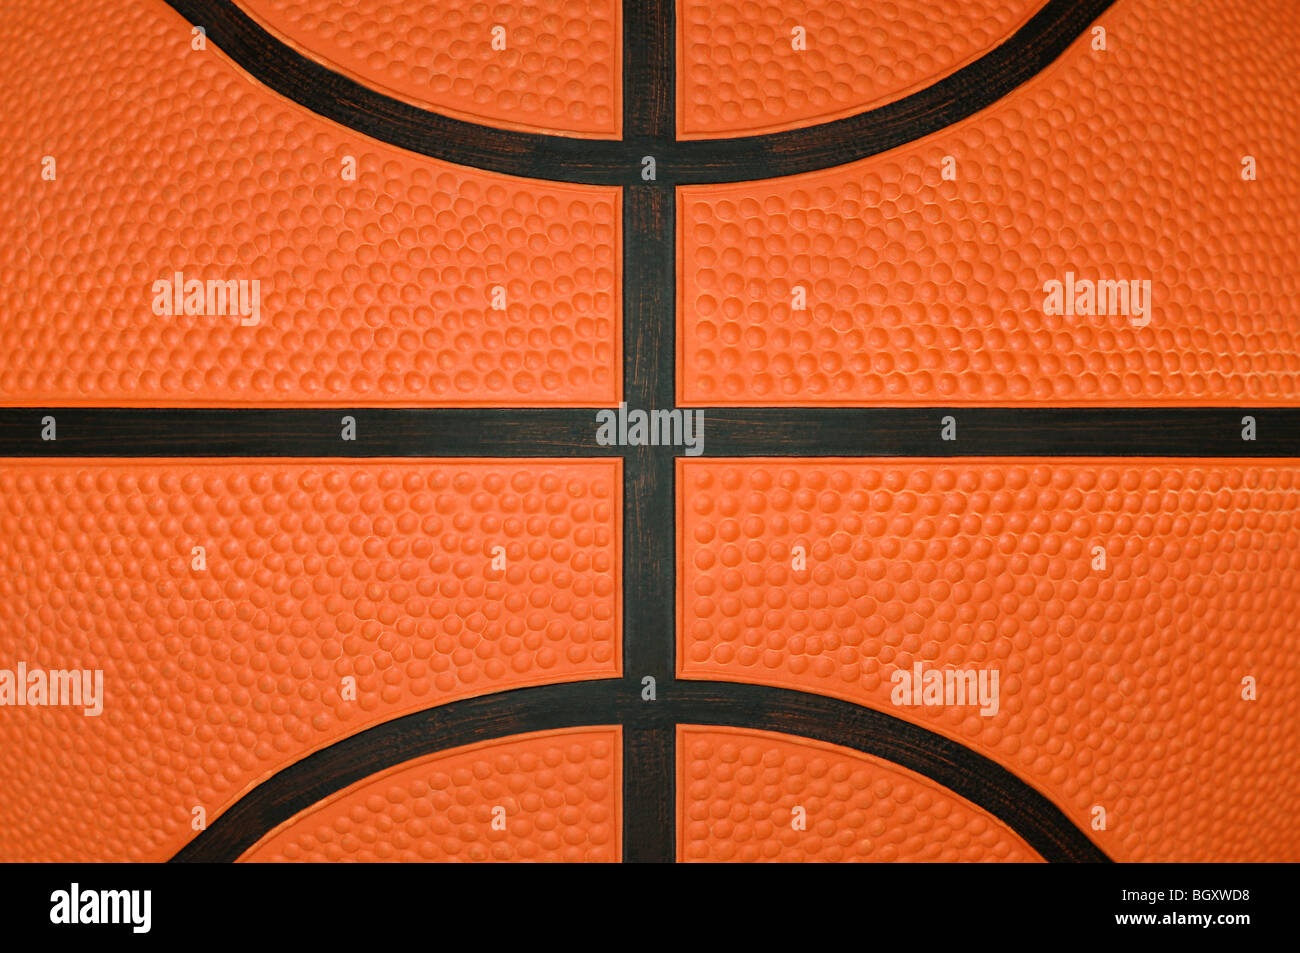 Basketball hautnah Stockfoto